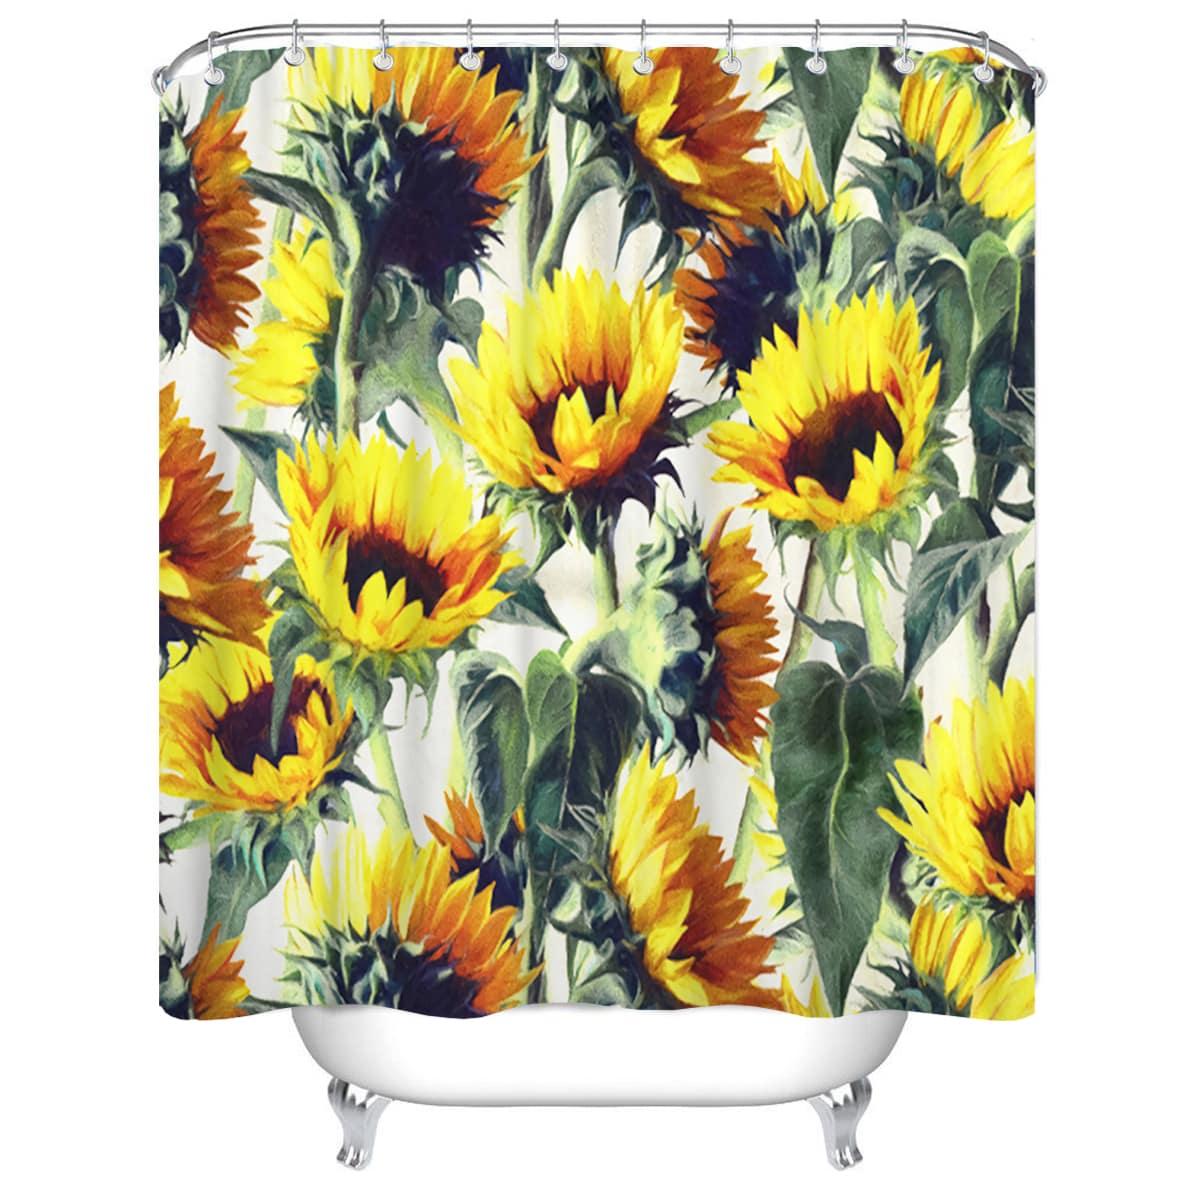 1 Stück Duschvorhang mit Sonnenblumen Muster